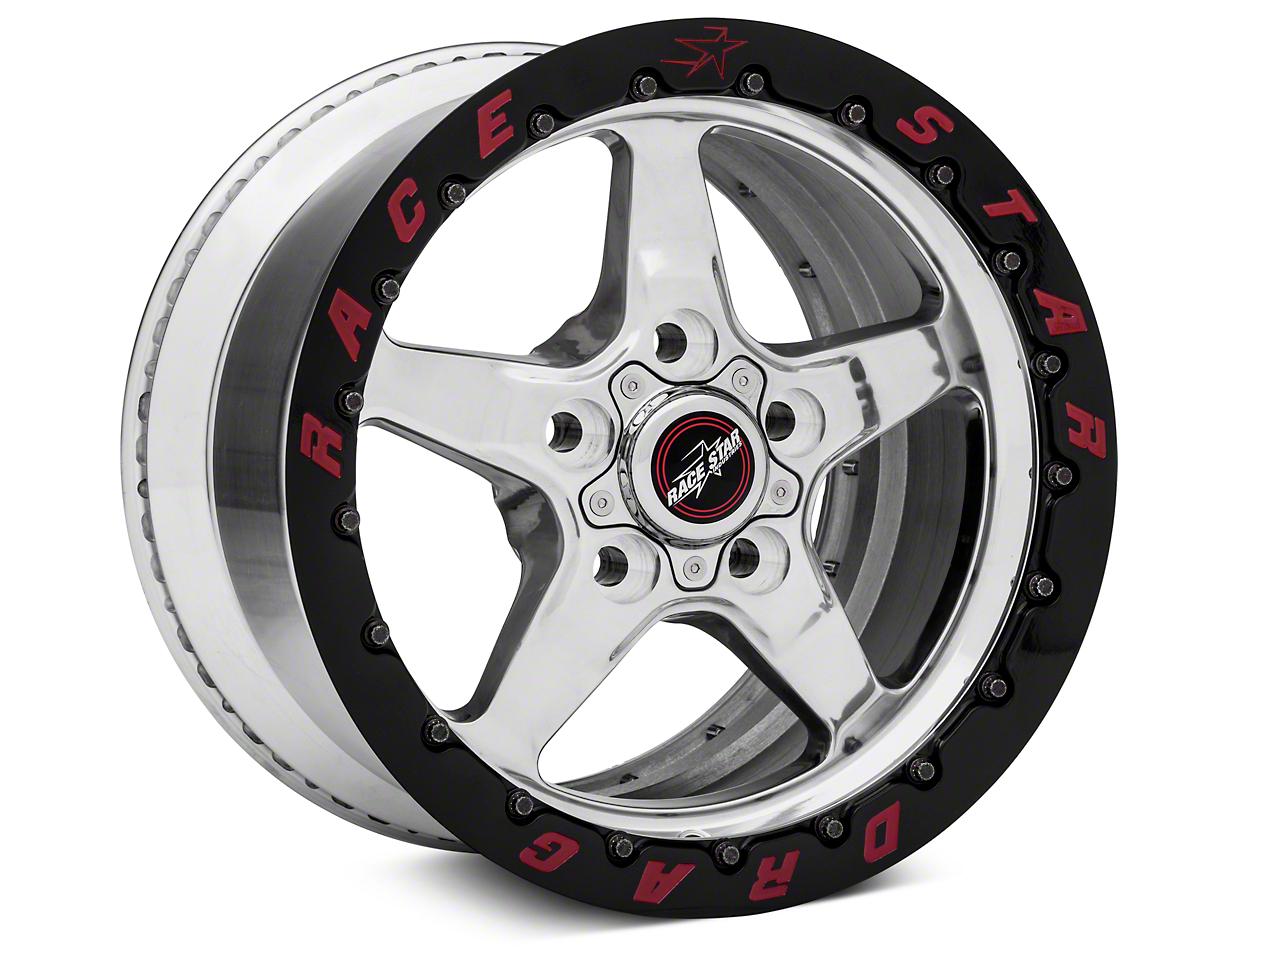 Race Star Drag Star 92 Double Bead Lock Drag Wheel - 15x10 (05-14 All: Excludes 07-14 GT500)